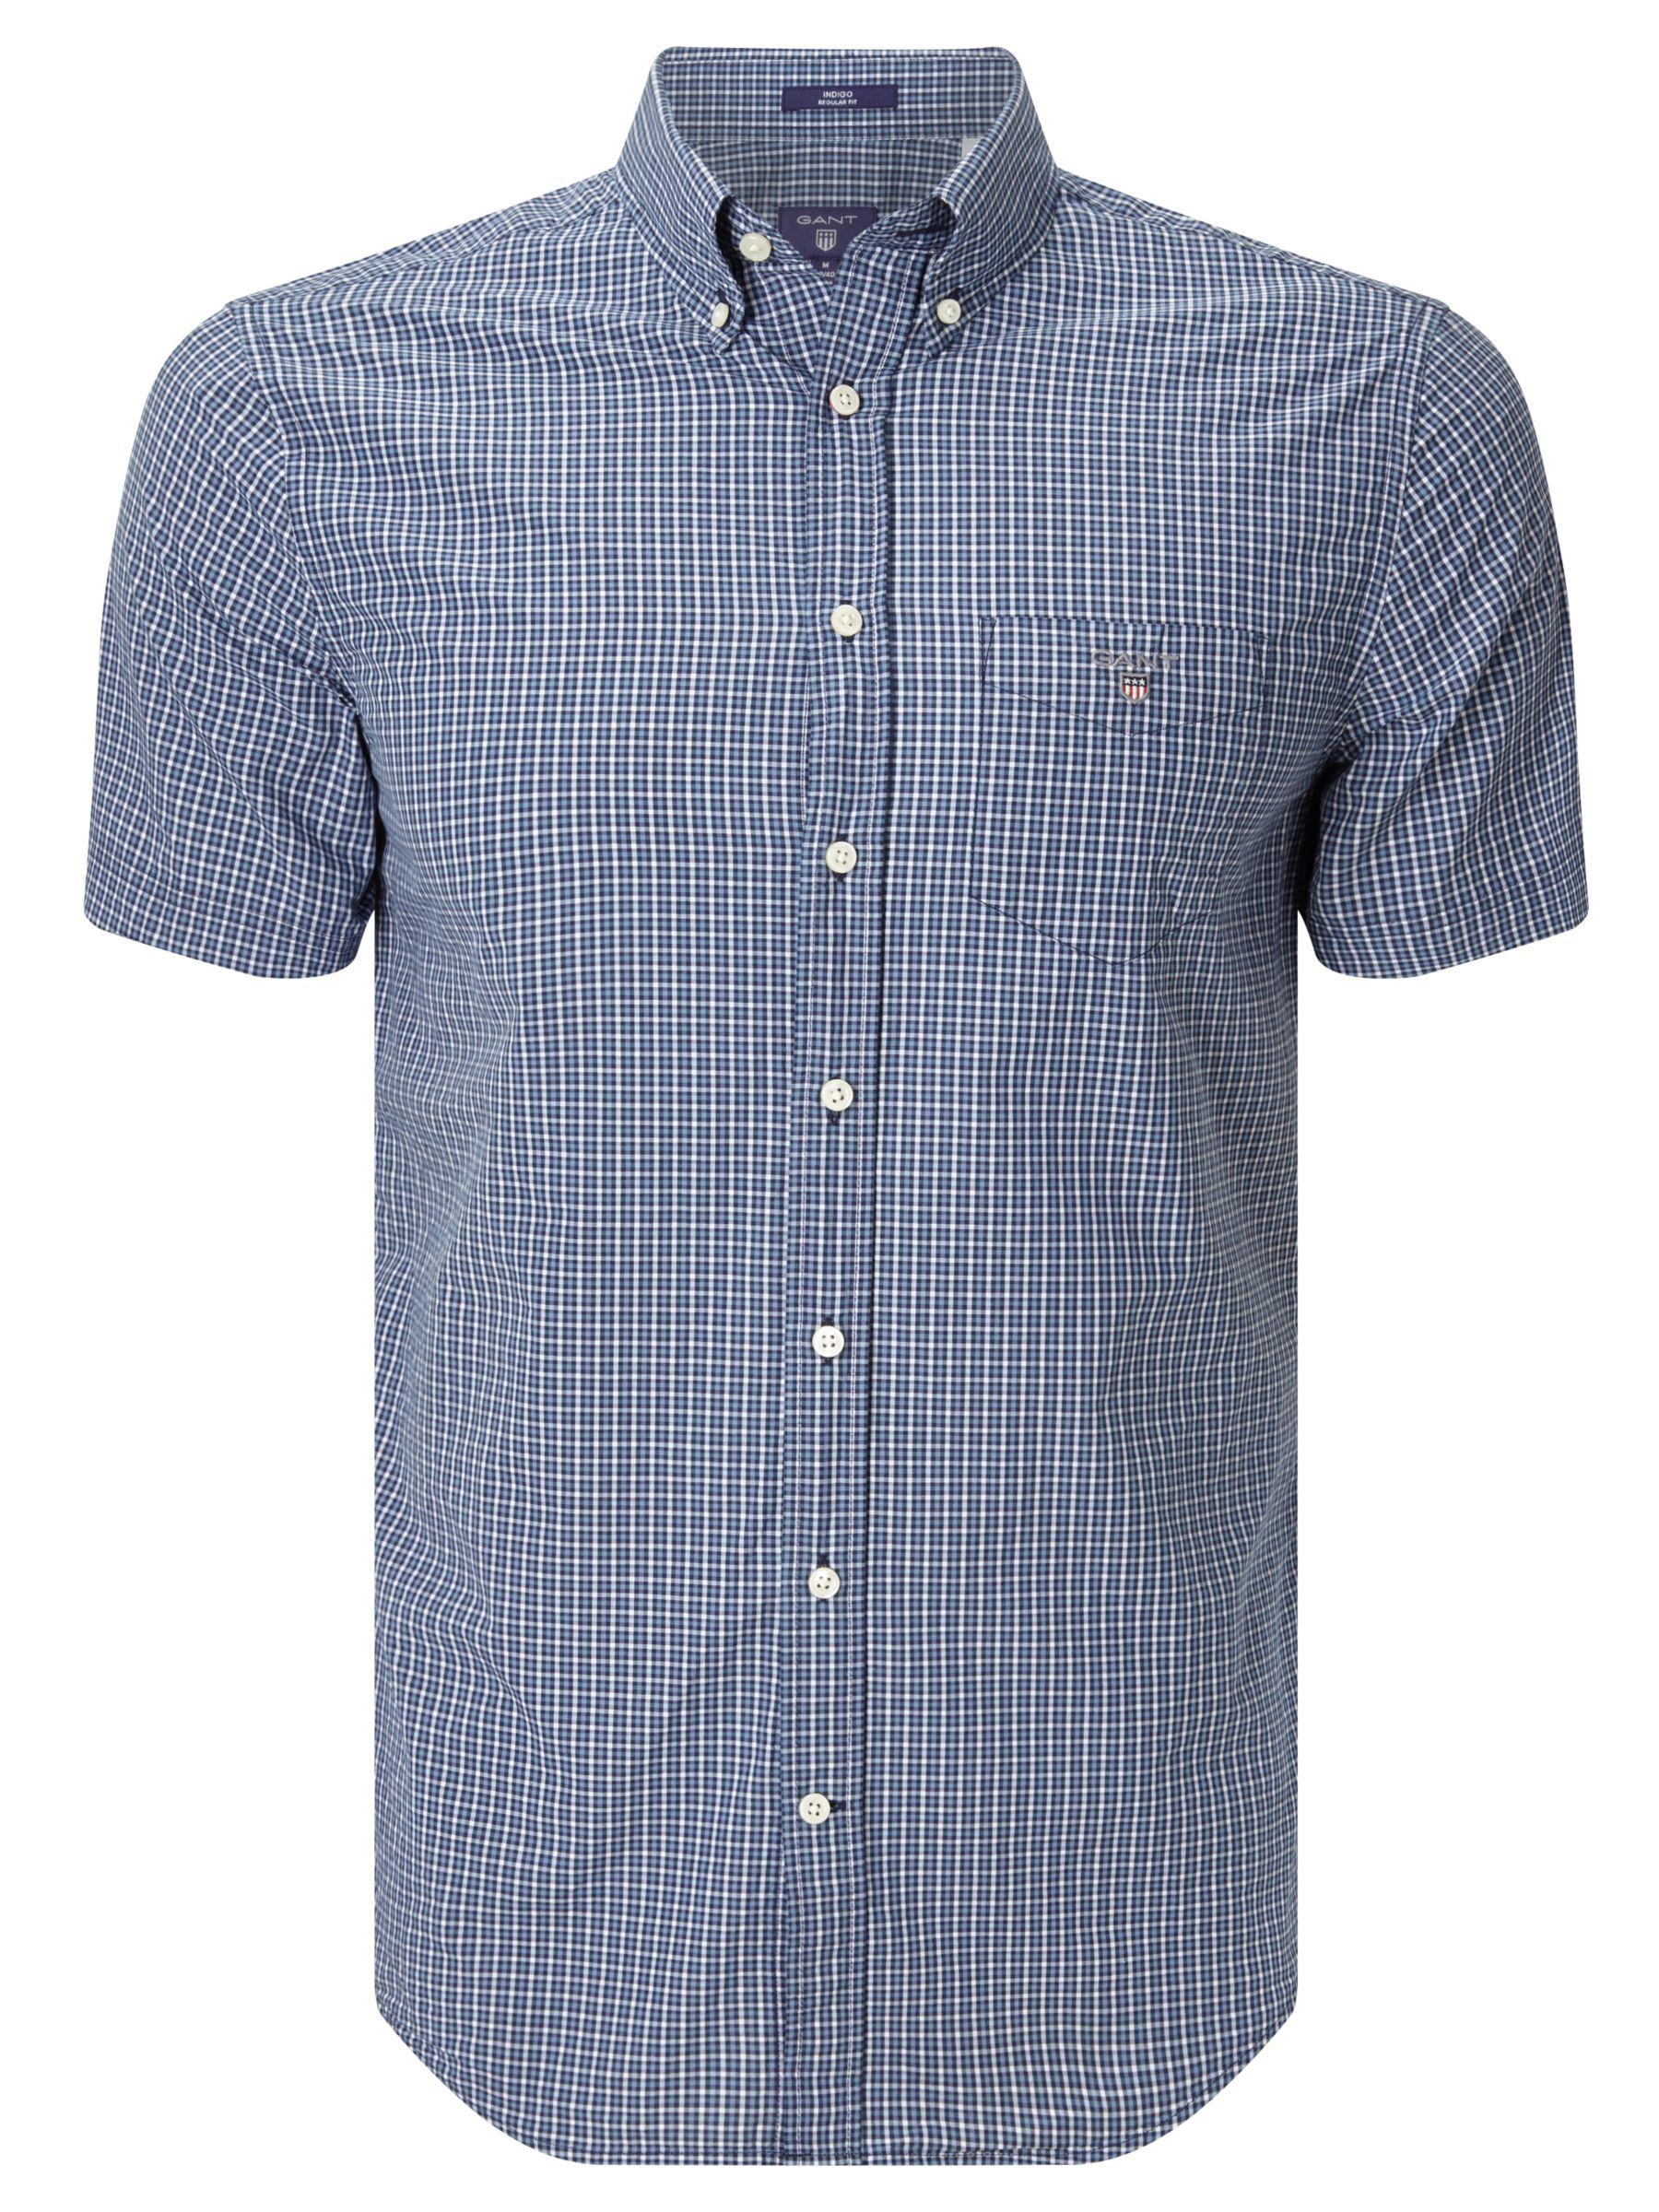 fbab333cbec Gant Indigo Gingham Short Sleeve Shirt, Indigo at John Lewis & Partners